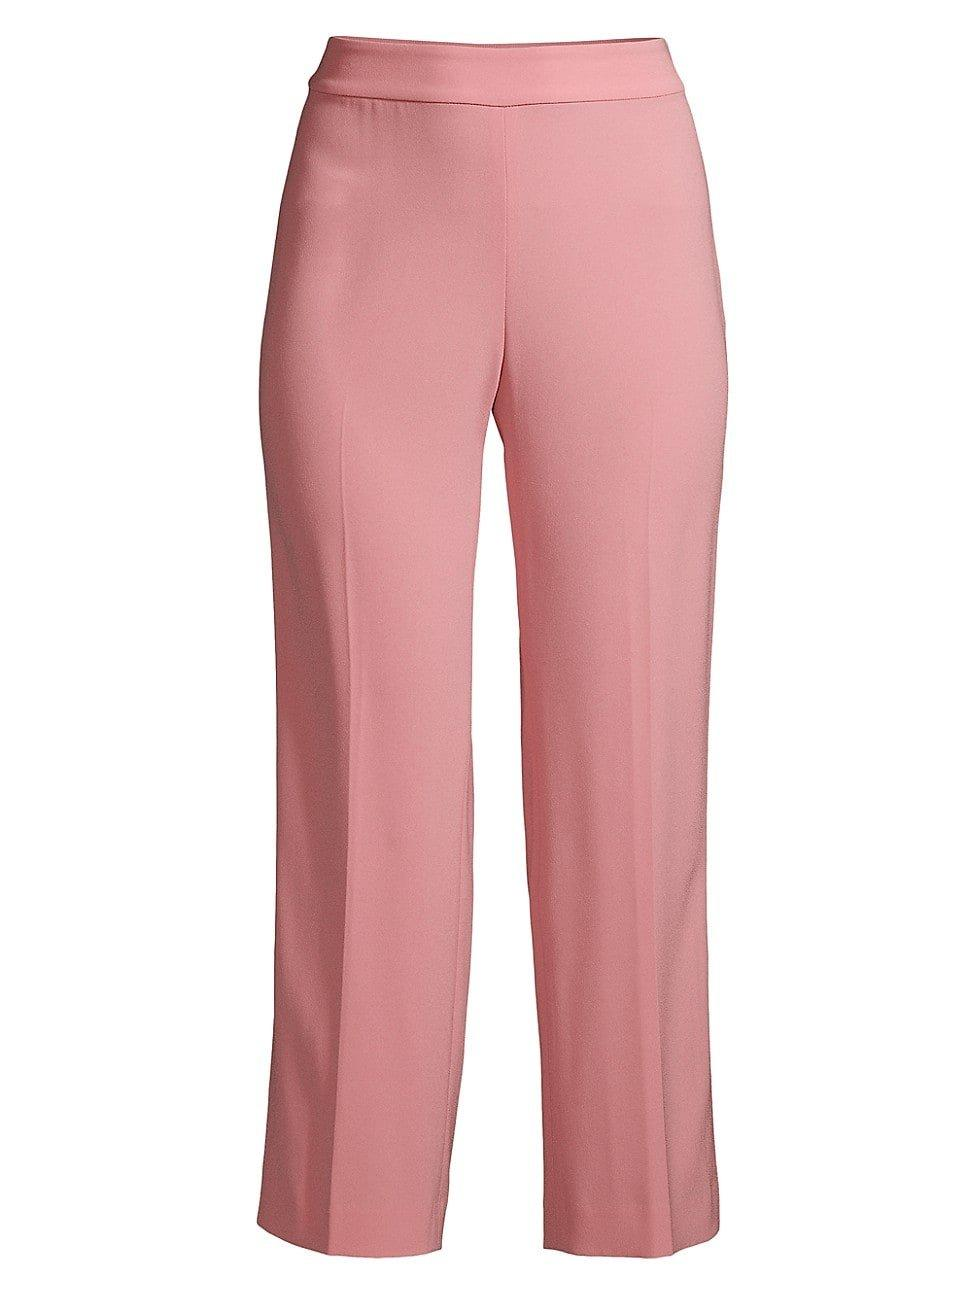 Isabella Cropped Soft Pant Item # KE0P05-1F